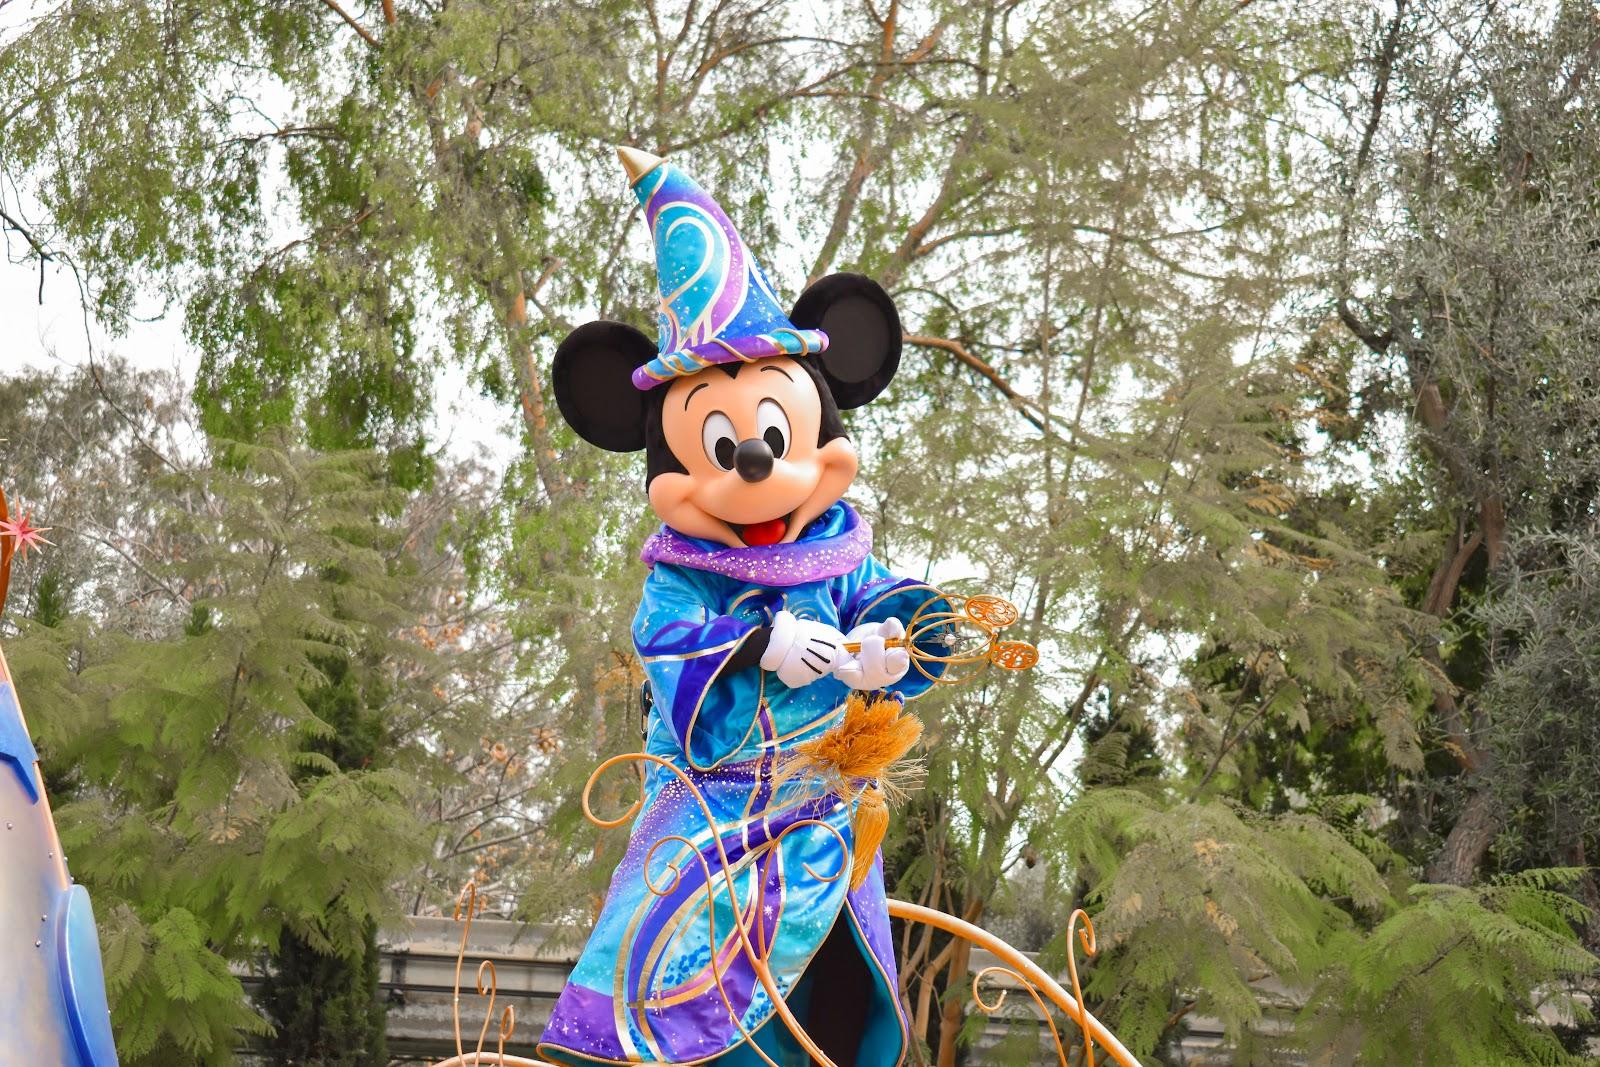 mickey in the magic happens parade at Disneyland